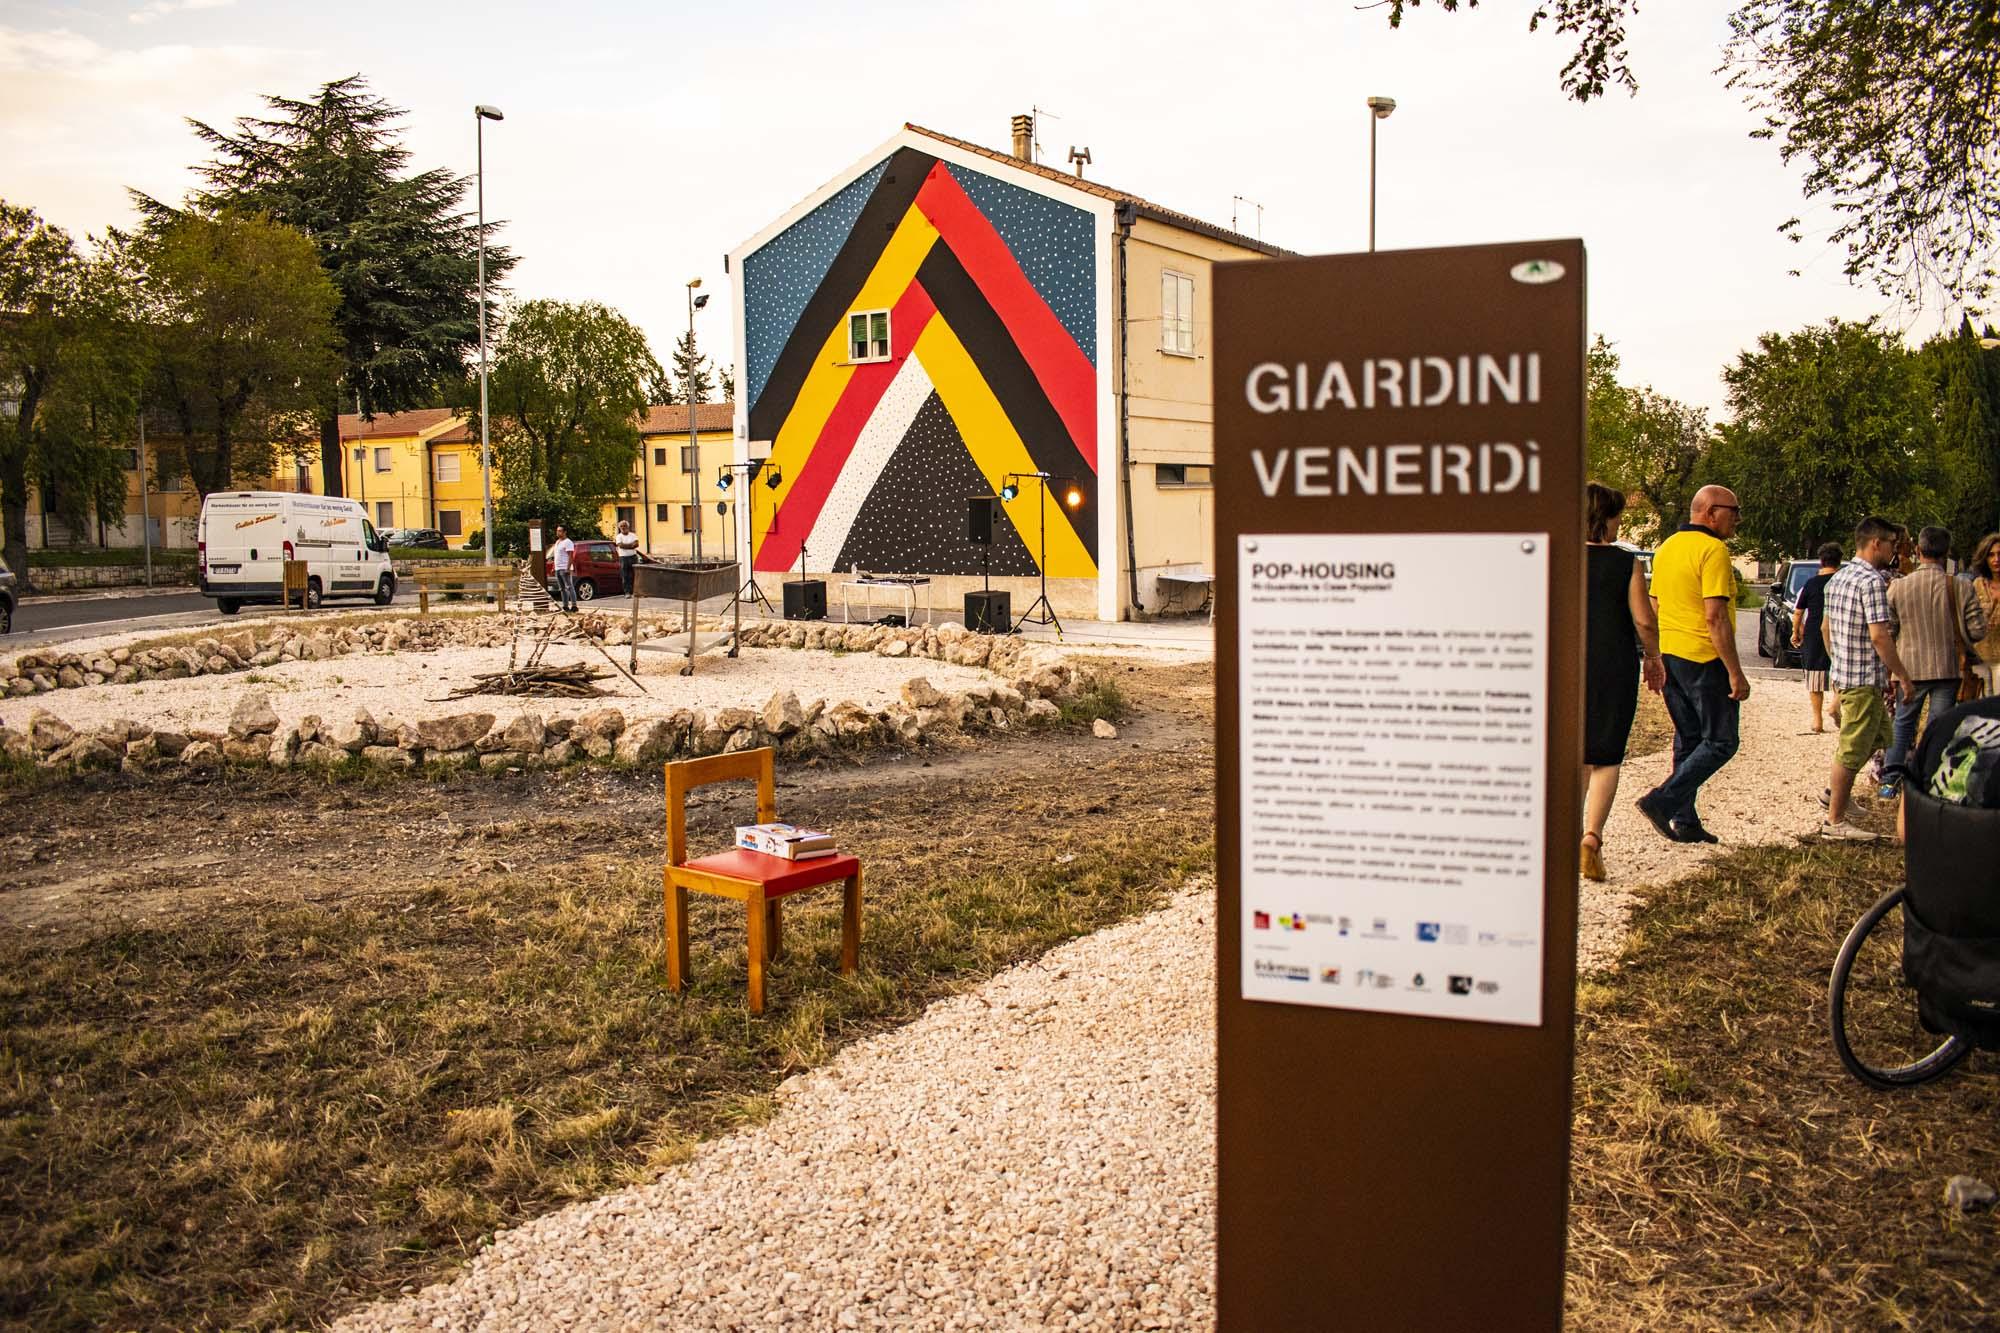 07.2019 #fullcolor - Nardulli e Lieto I ARCHITECTURE OF SHAME I Matera